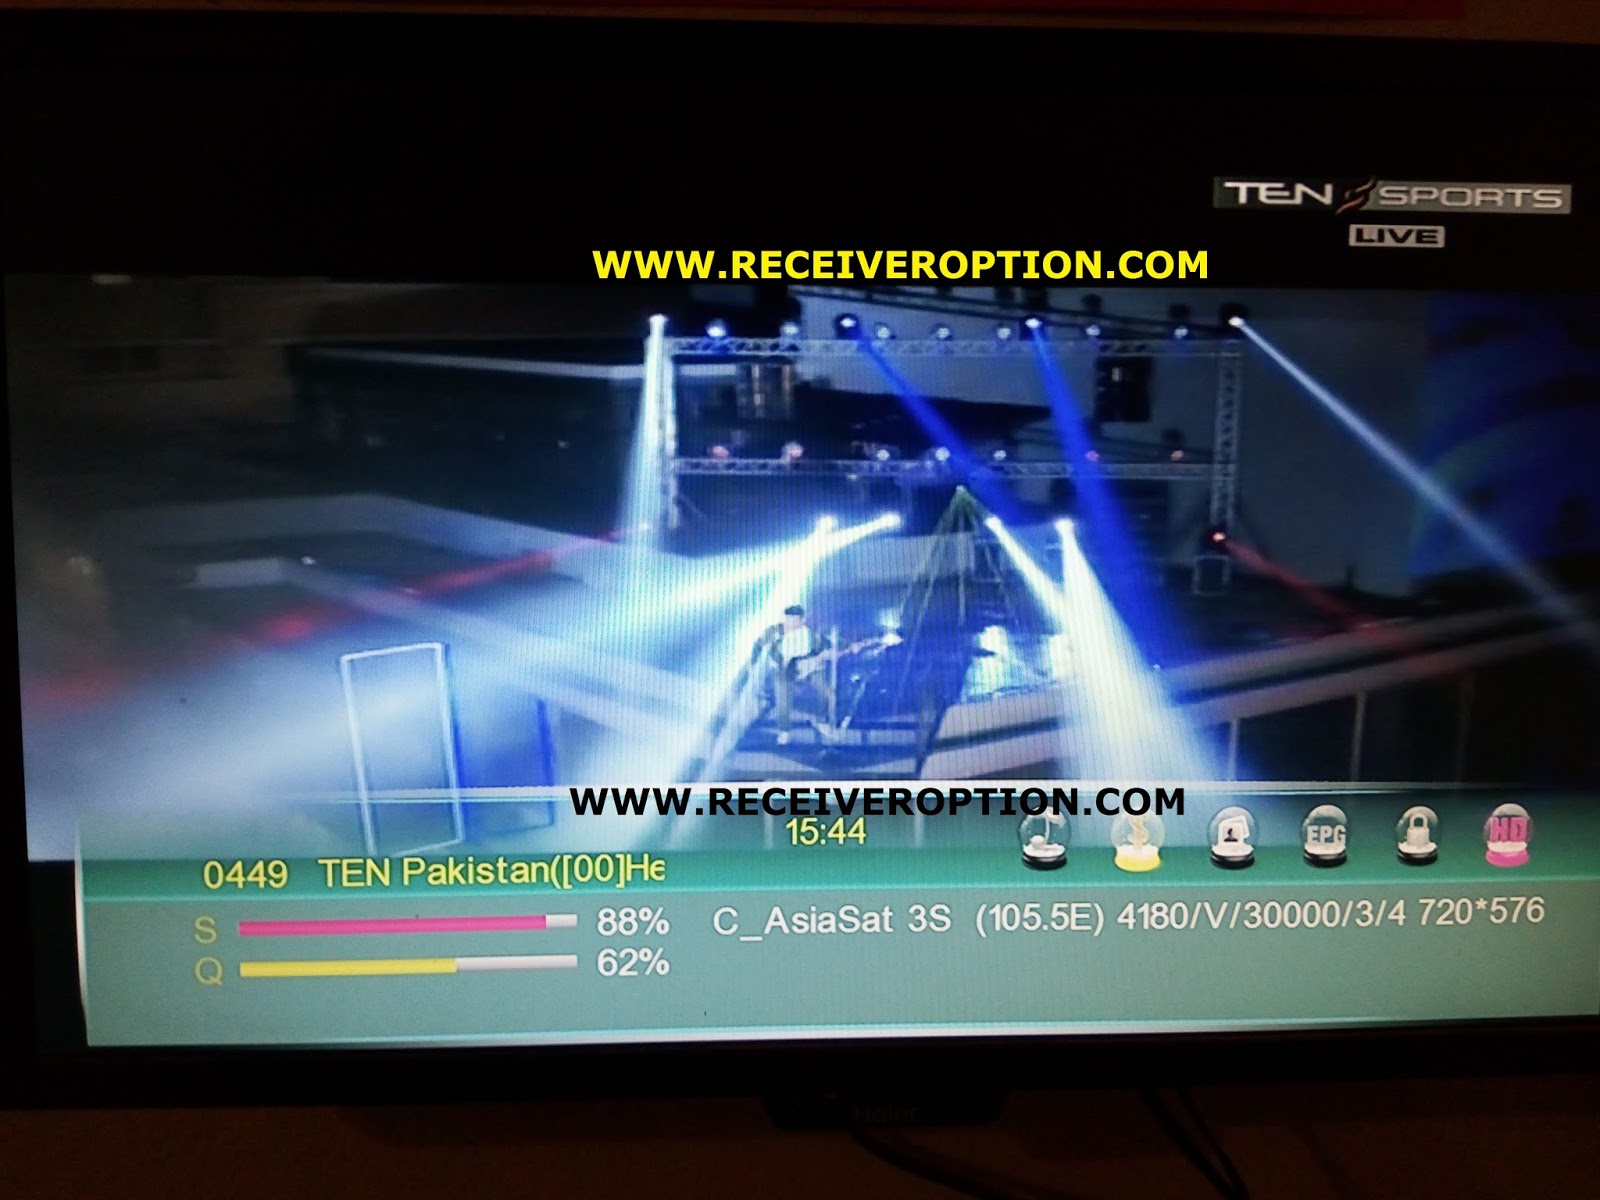 SUPER MAX SM 3000 HD 3G RECEIVER POWERVU KEY SOFTWARE - HOW